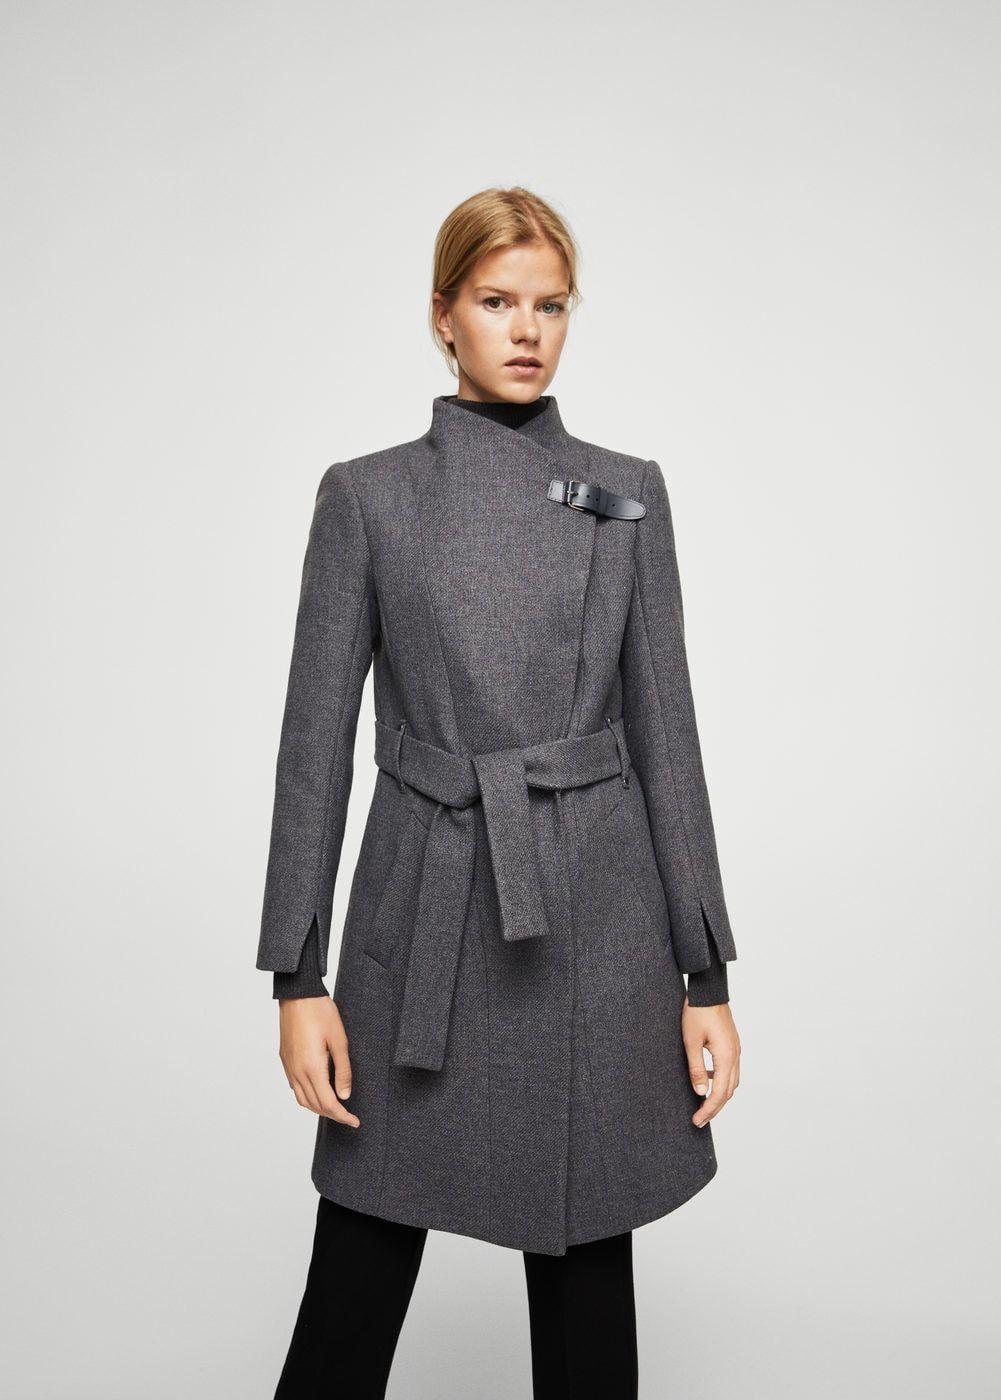 Abrigo lana cinturón - Mujer  f4094cc2fd61